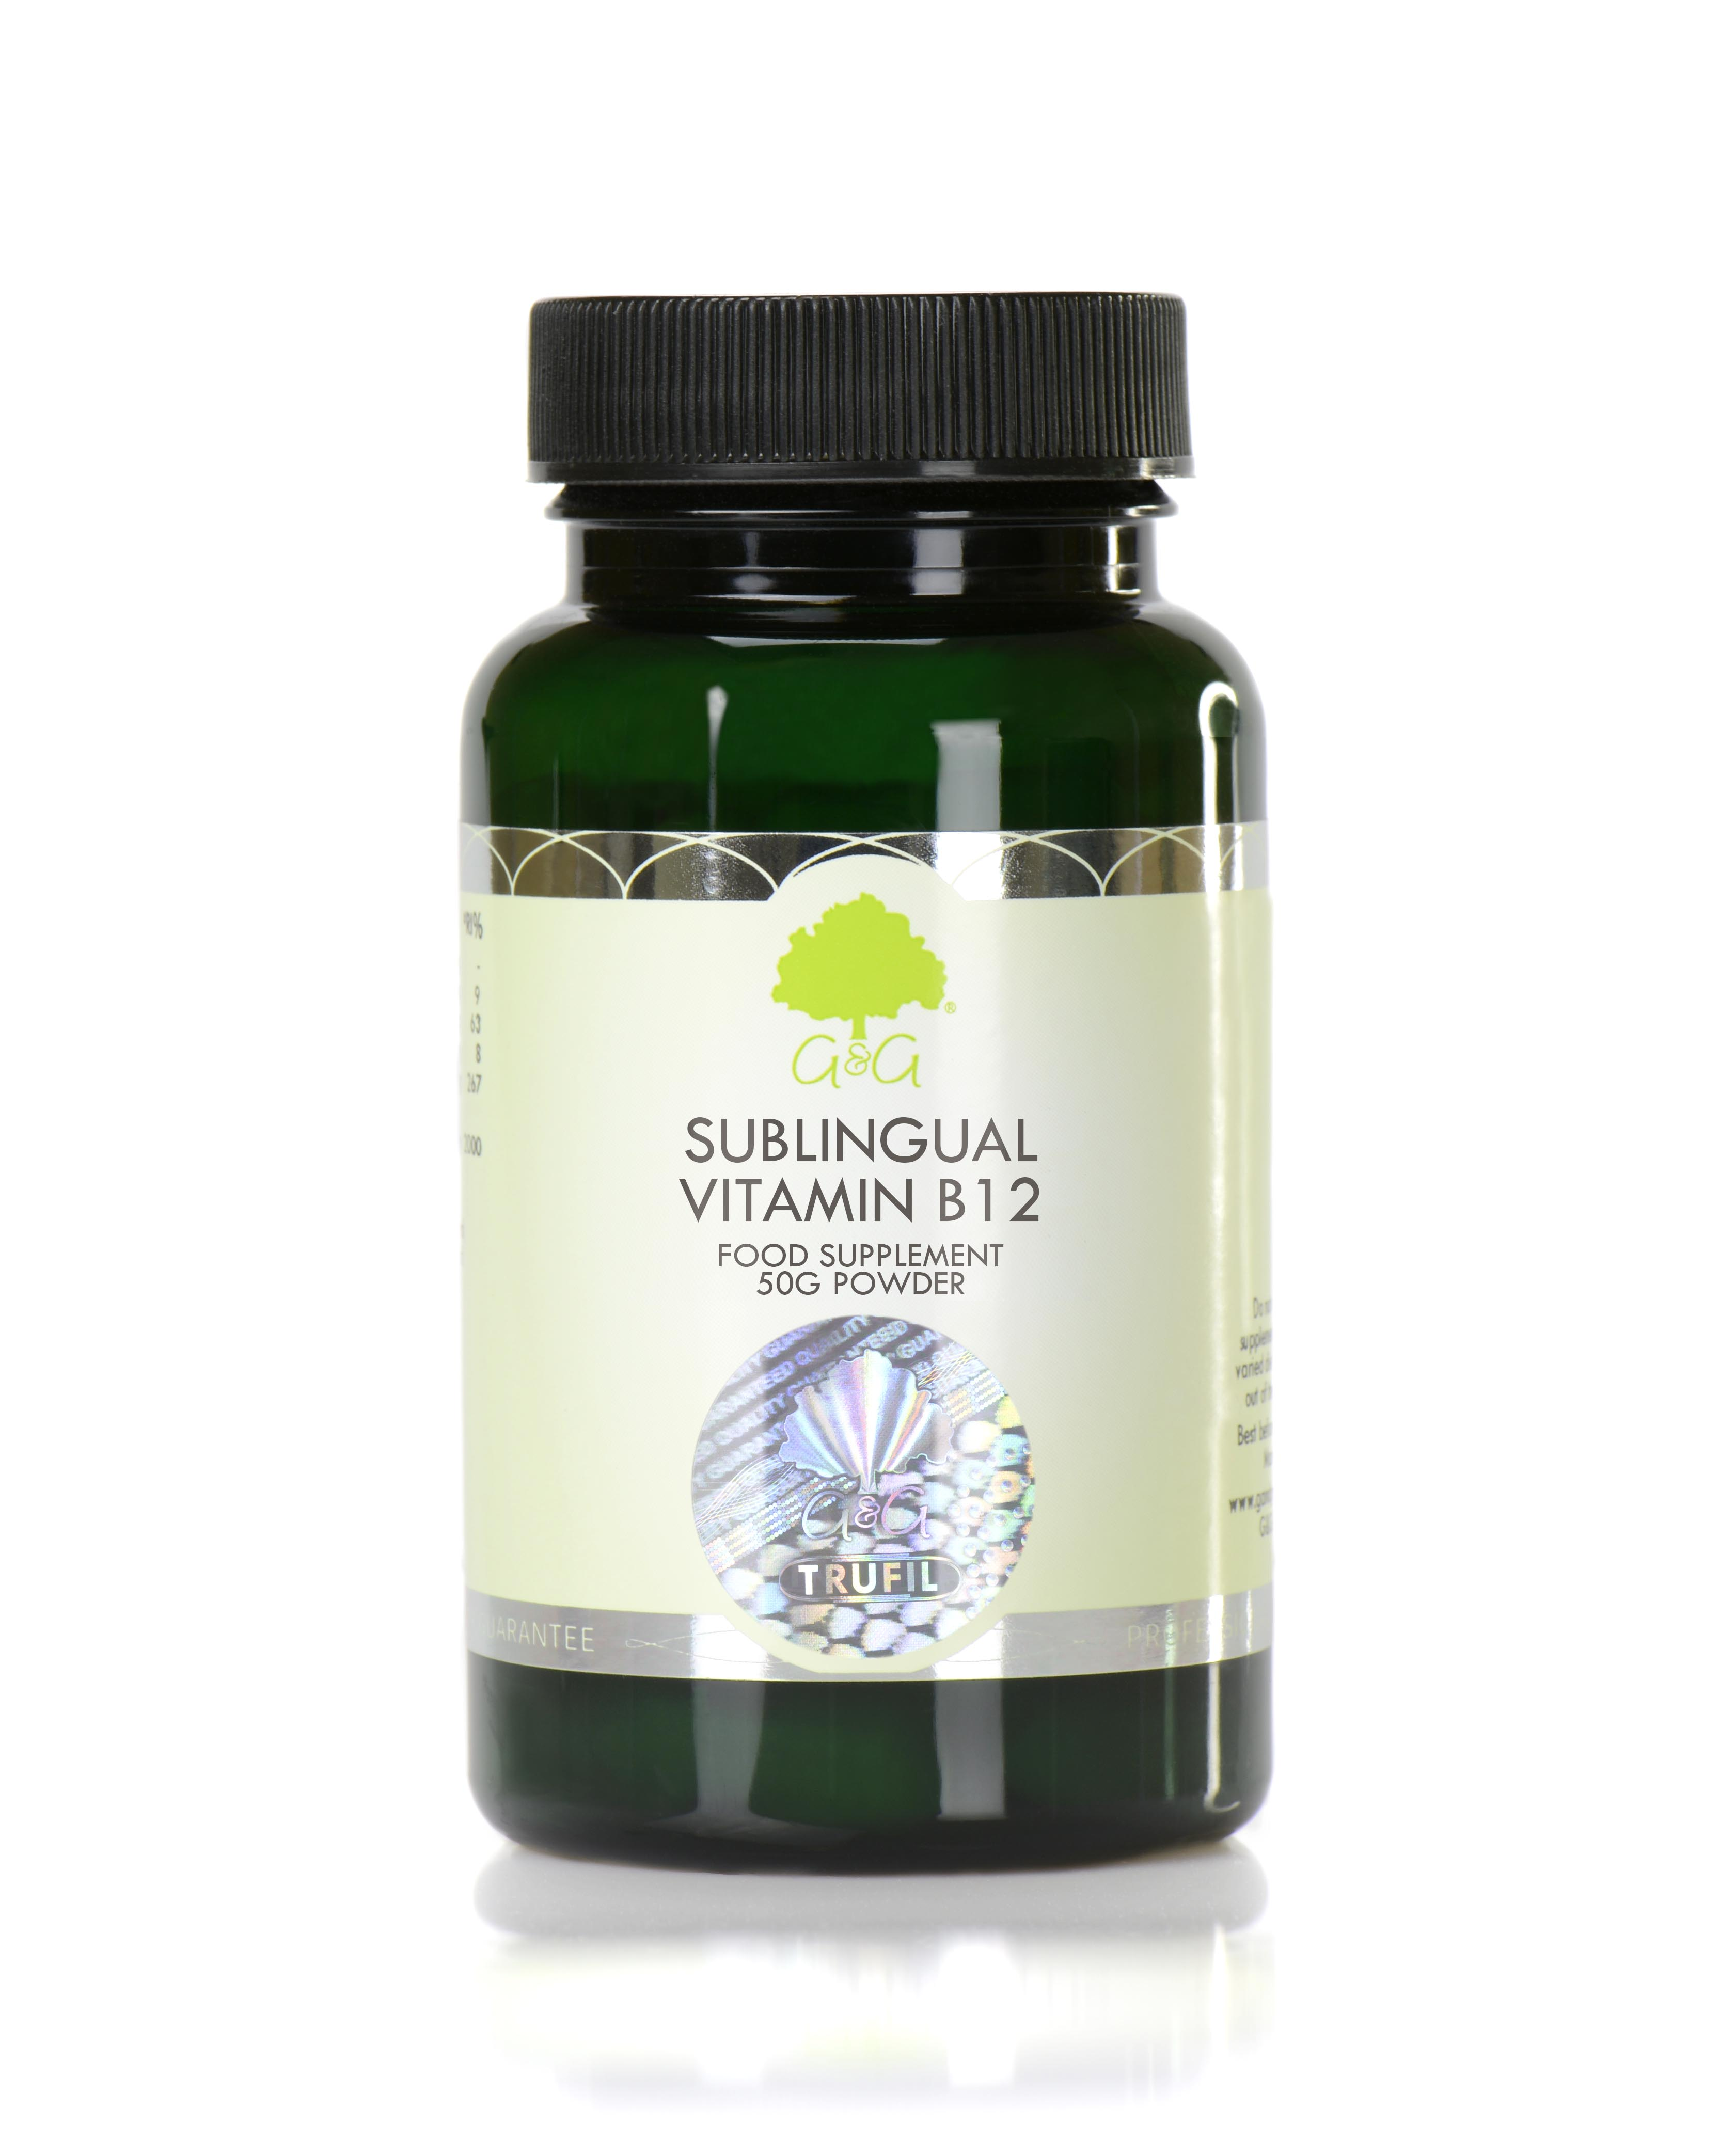 Sublingual Vitamin B12 50g